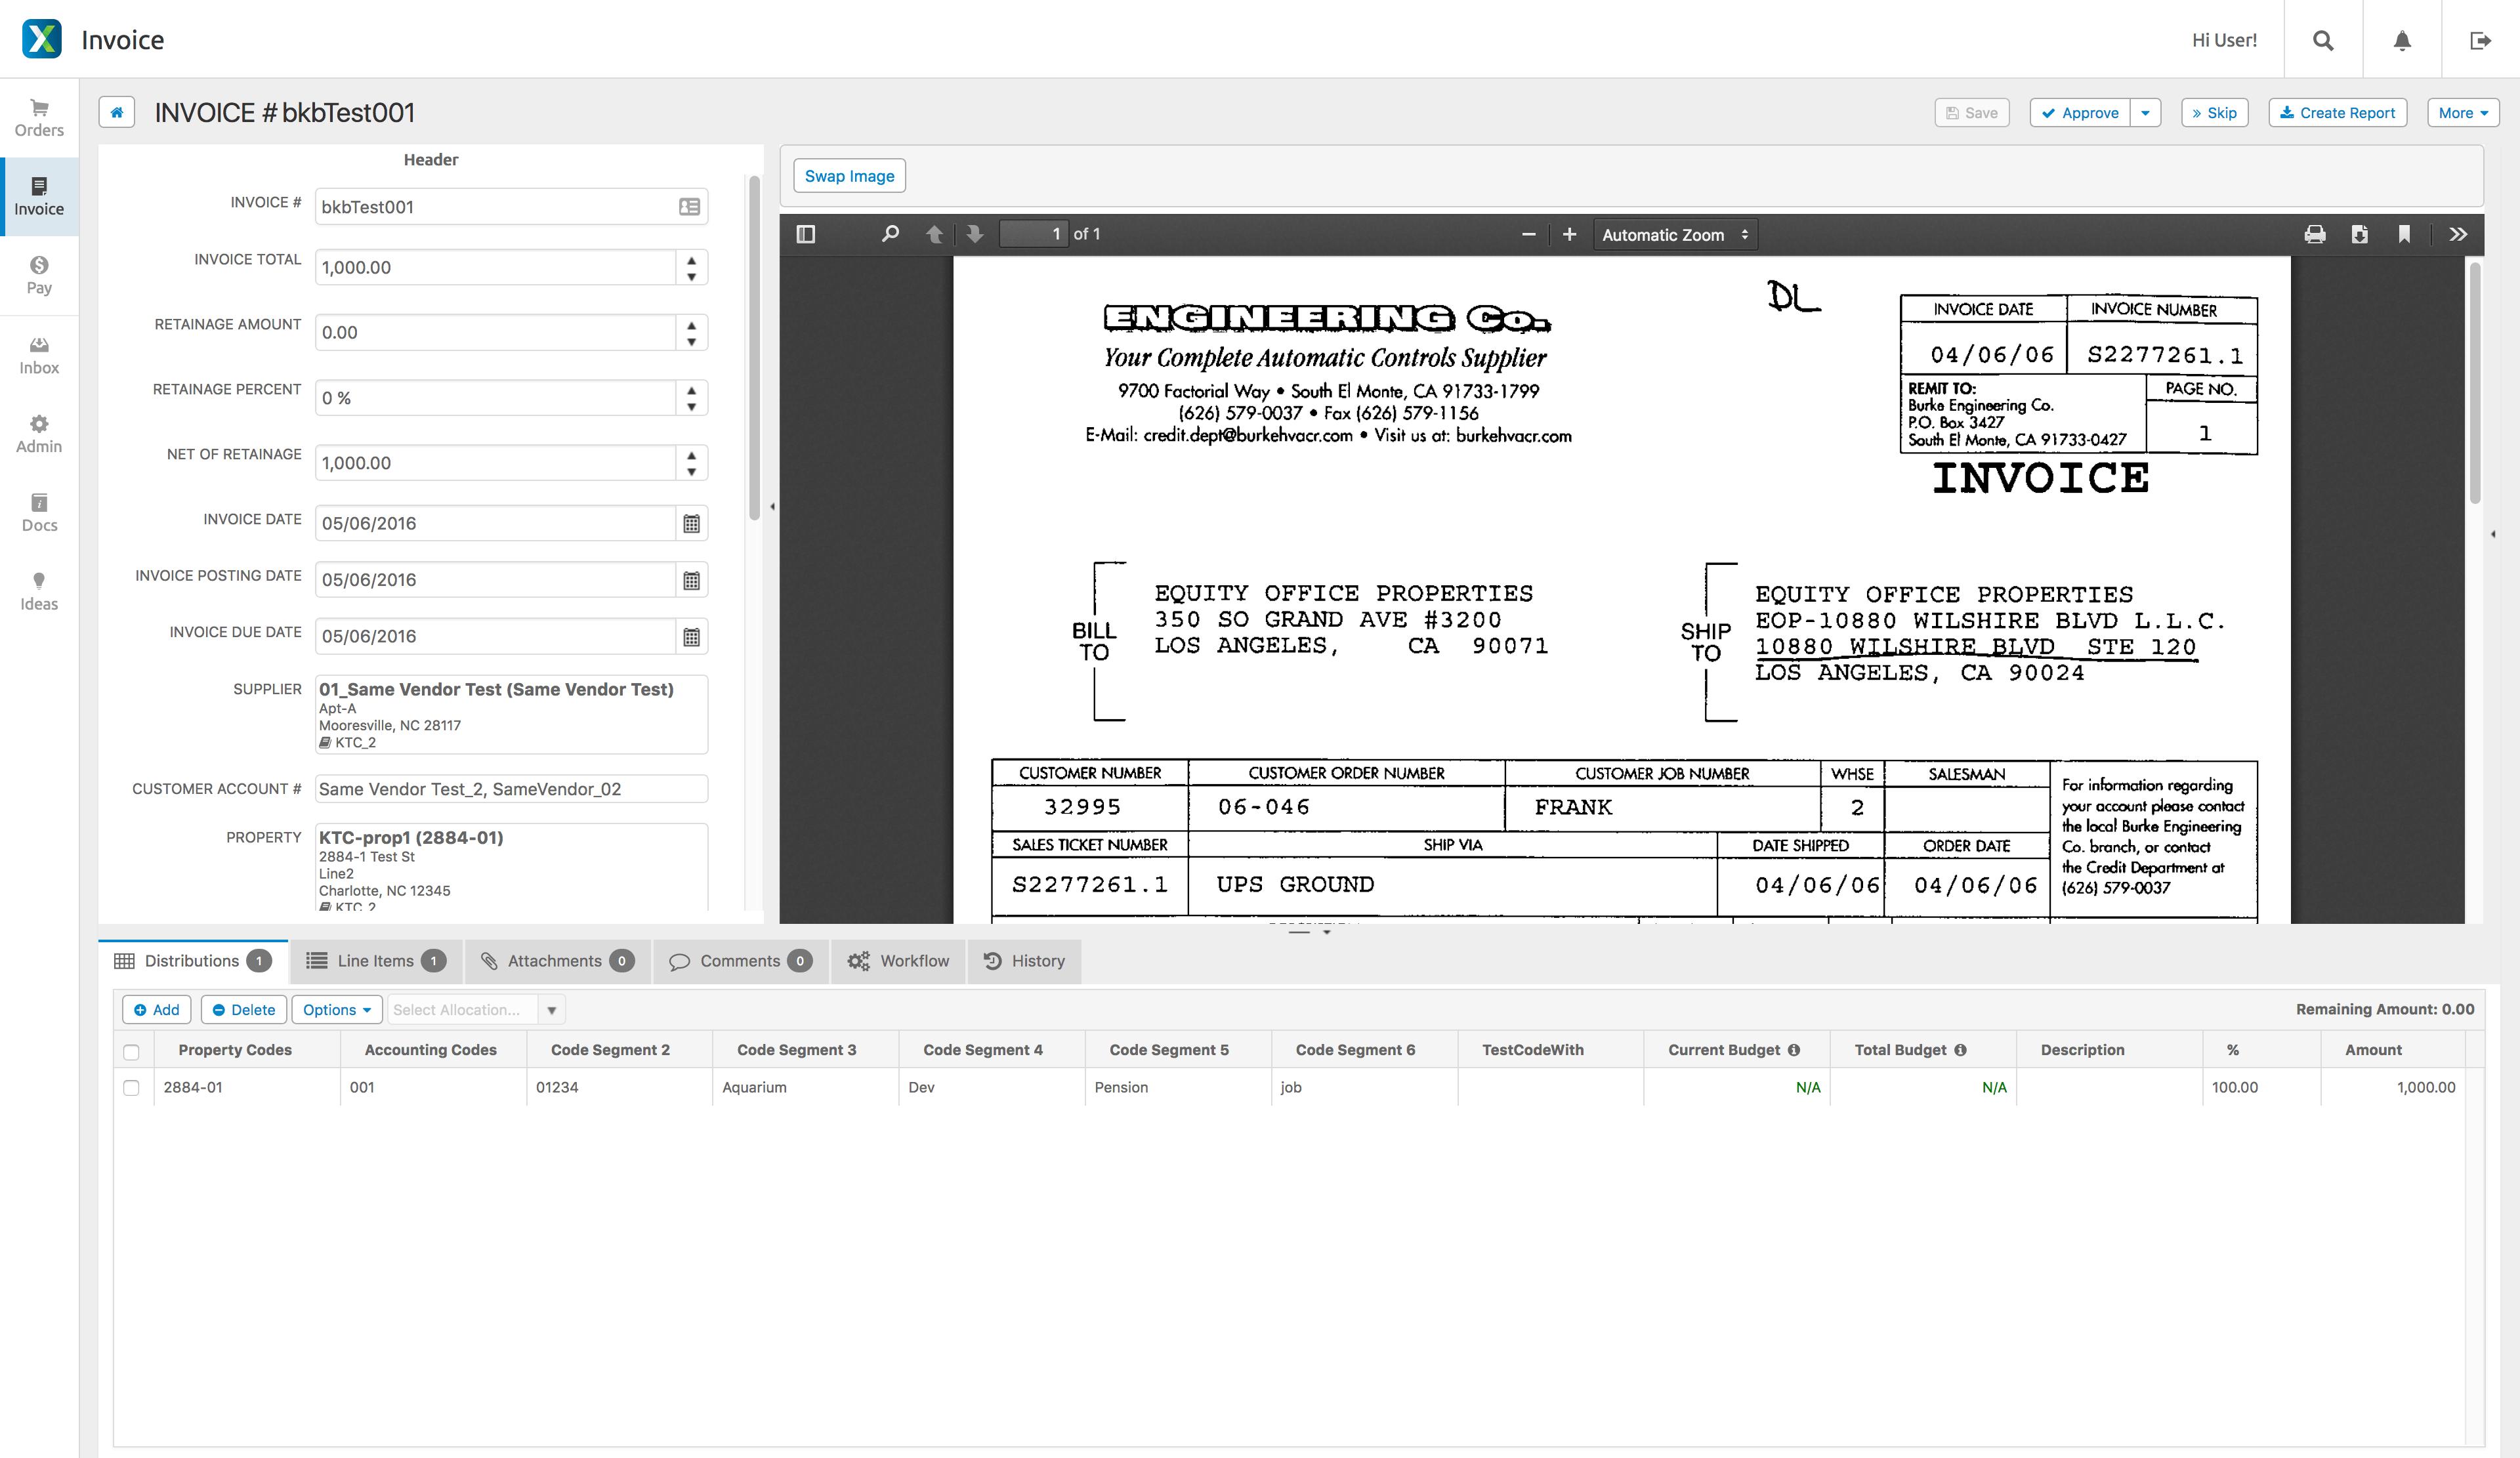 AvidXchange Software - AvidXchange invoice detail screenshot